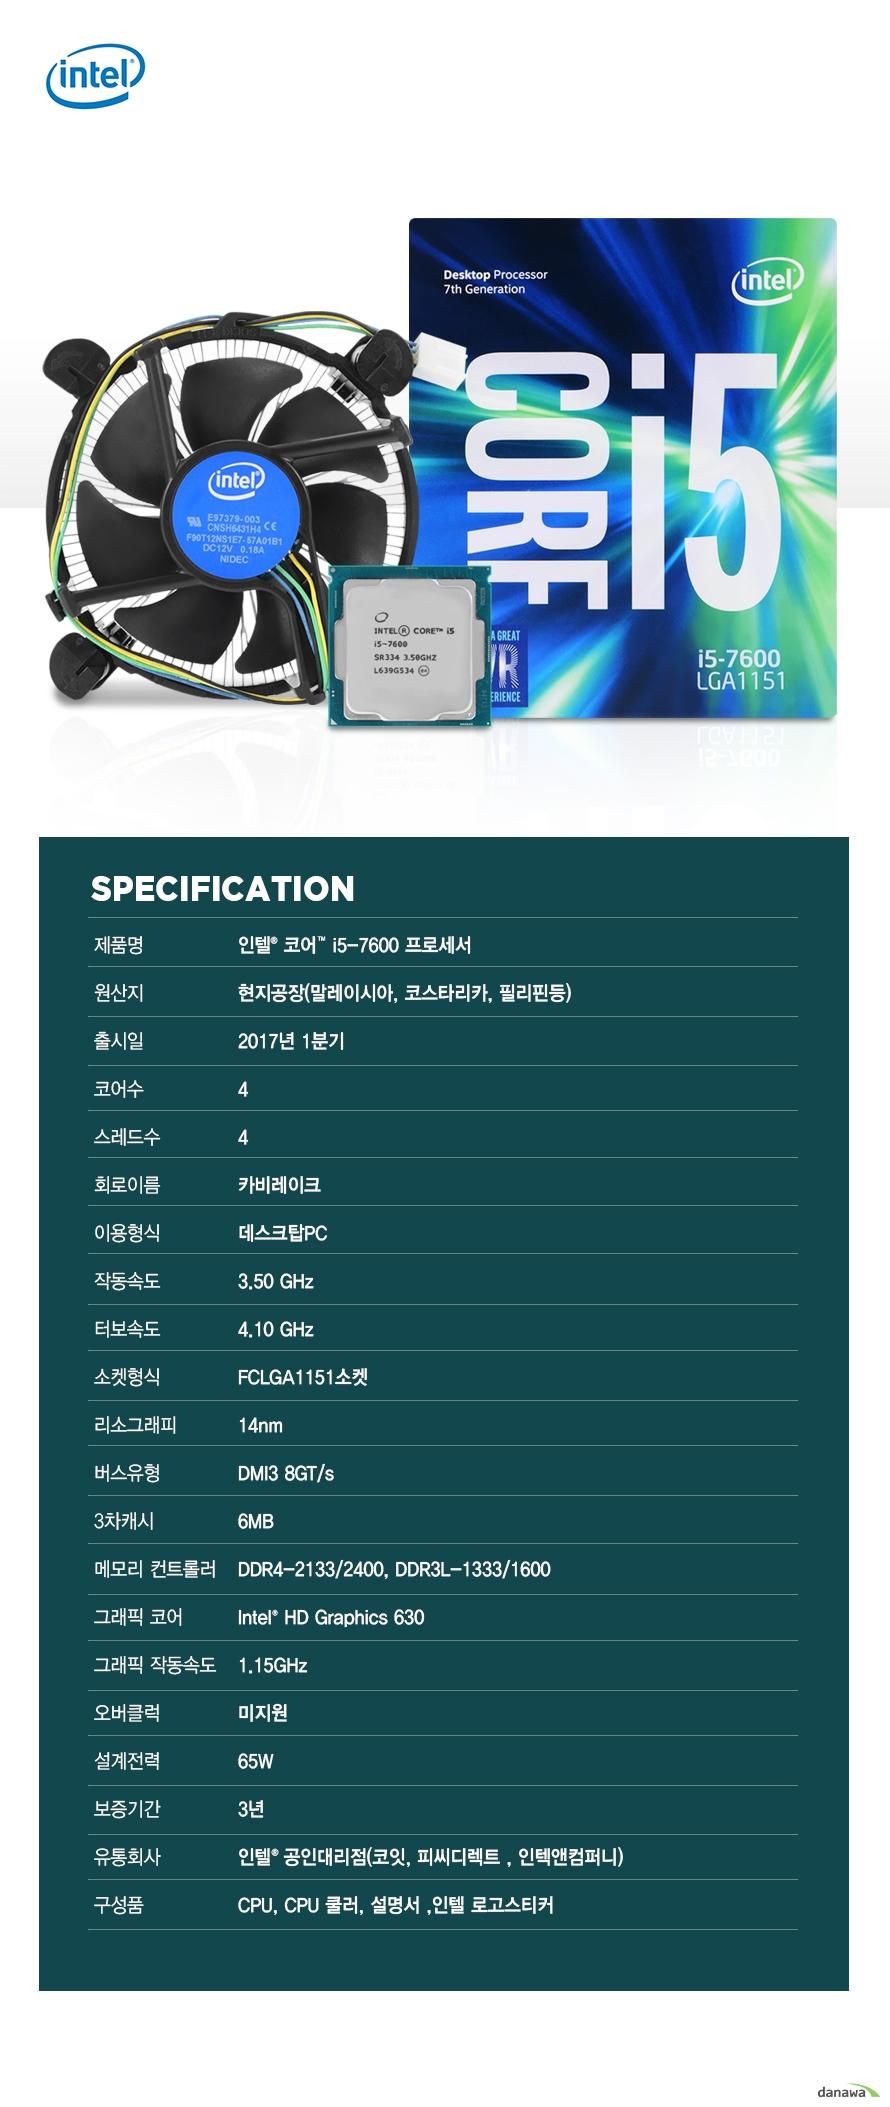 SPECIFICATION                제품명 인텔 코어 i5 - 7600 프로세서                        원산지 현지공장 말레이시아 코스타리카 필리핀등                출시일 2017년 1분기                코어수 4                스레드수 4                회로이름 카비레이크                이용형식 데스크탑PC                작동속도 3.50GHZ                터보속도 4.10GHZ                소켓형식 FCLGA1151소켓                리소그래피 14NM                버스유형 DMI3 8GT/S                3차캐시 6MB                메모리 컨트롤러 DDR4-2133/2400 DDR3L-1333/1600                그래픽 코어 INTEL HD GRAPHICS 630                그래픽 작동속도 1.15GHZ                오버클럭 미지원                설계전력 65W                보증기간 3년                유통회사 인텔 공인대리점 코잇 피씨디렉트 인텍엔 컴퍼니                구성품 CPU CPU쿨러 설명서 인텔 로고스티커